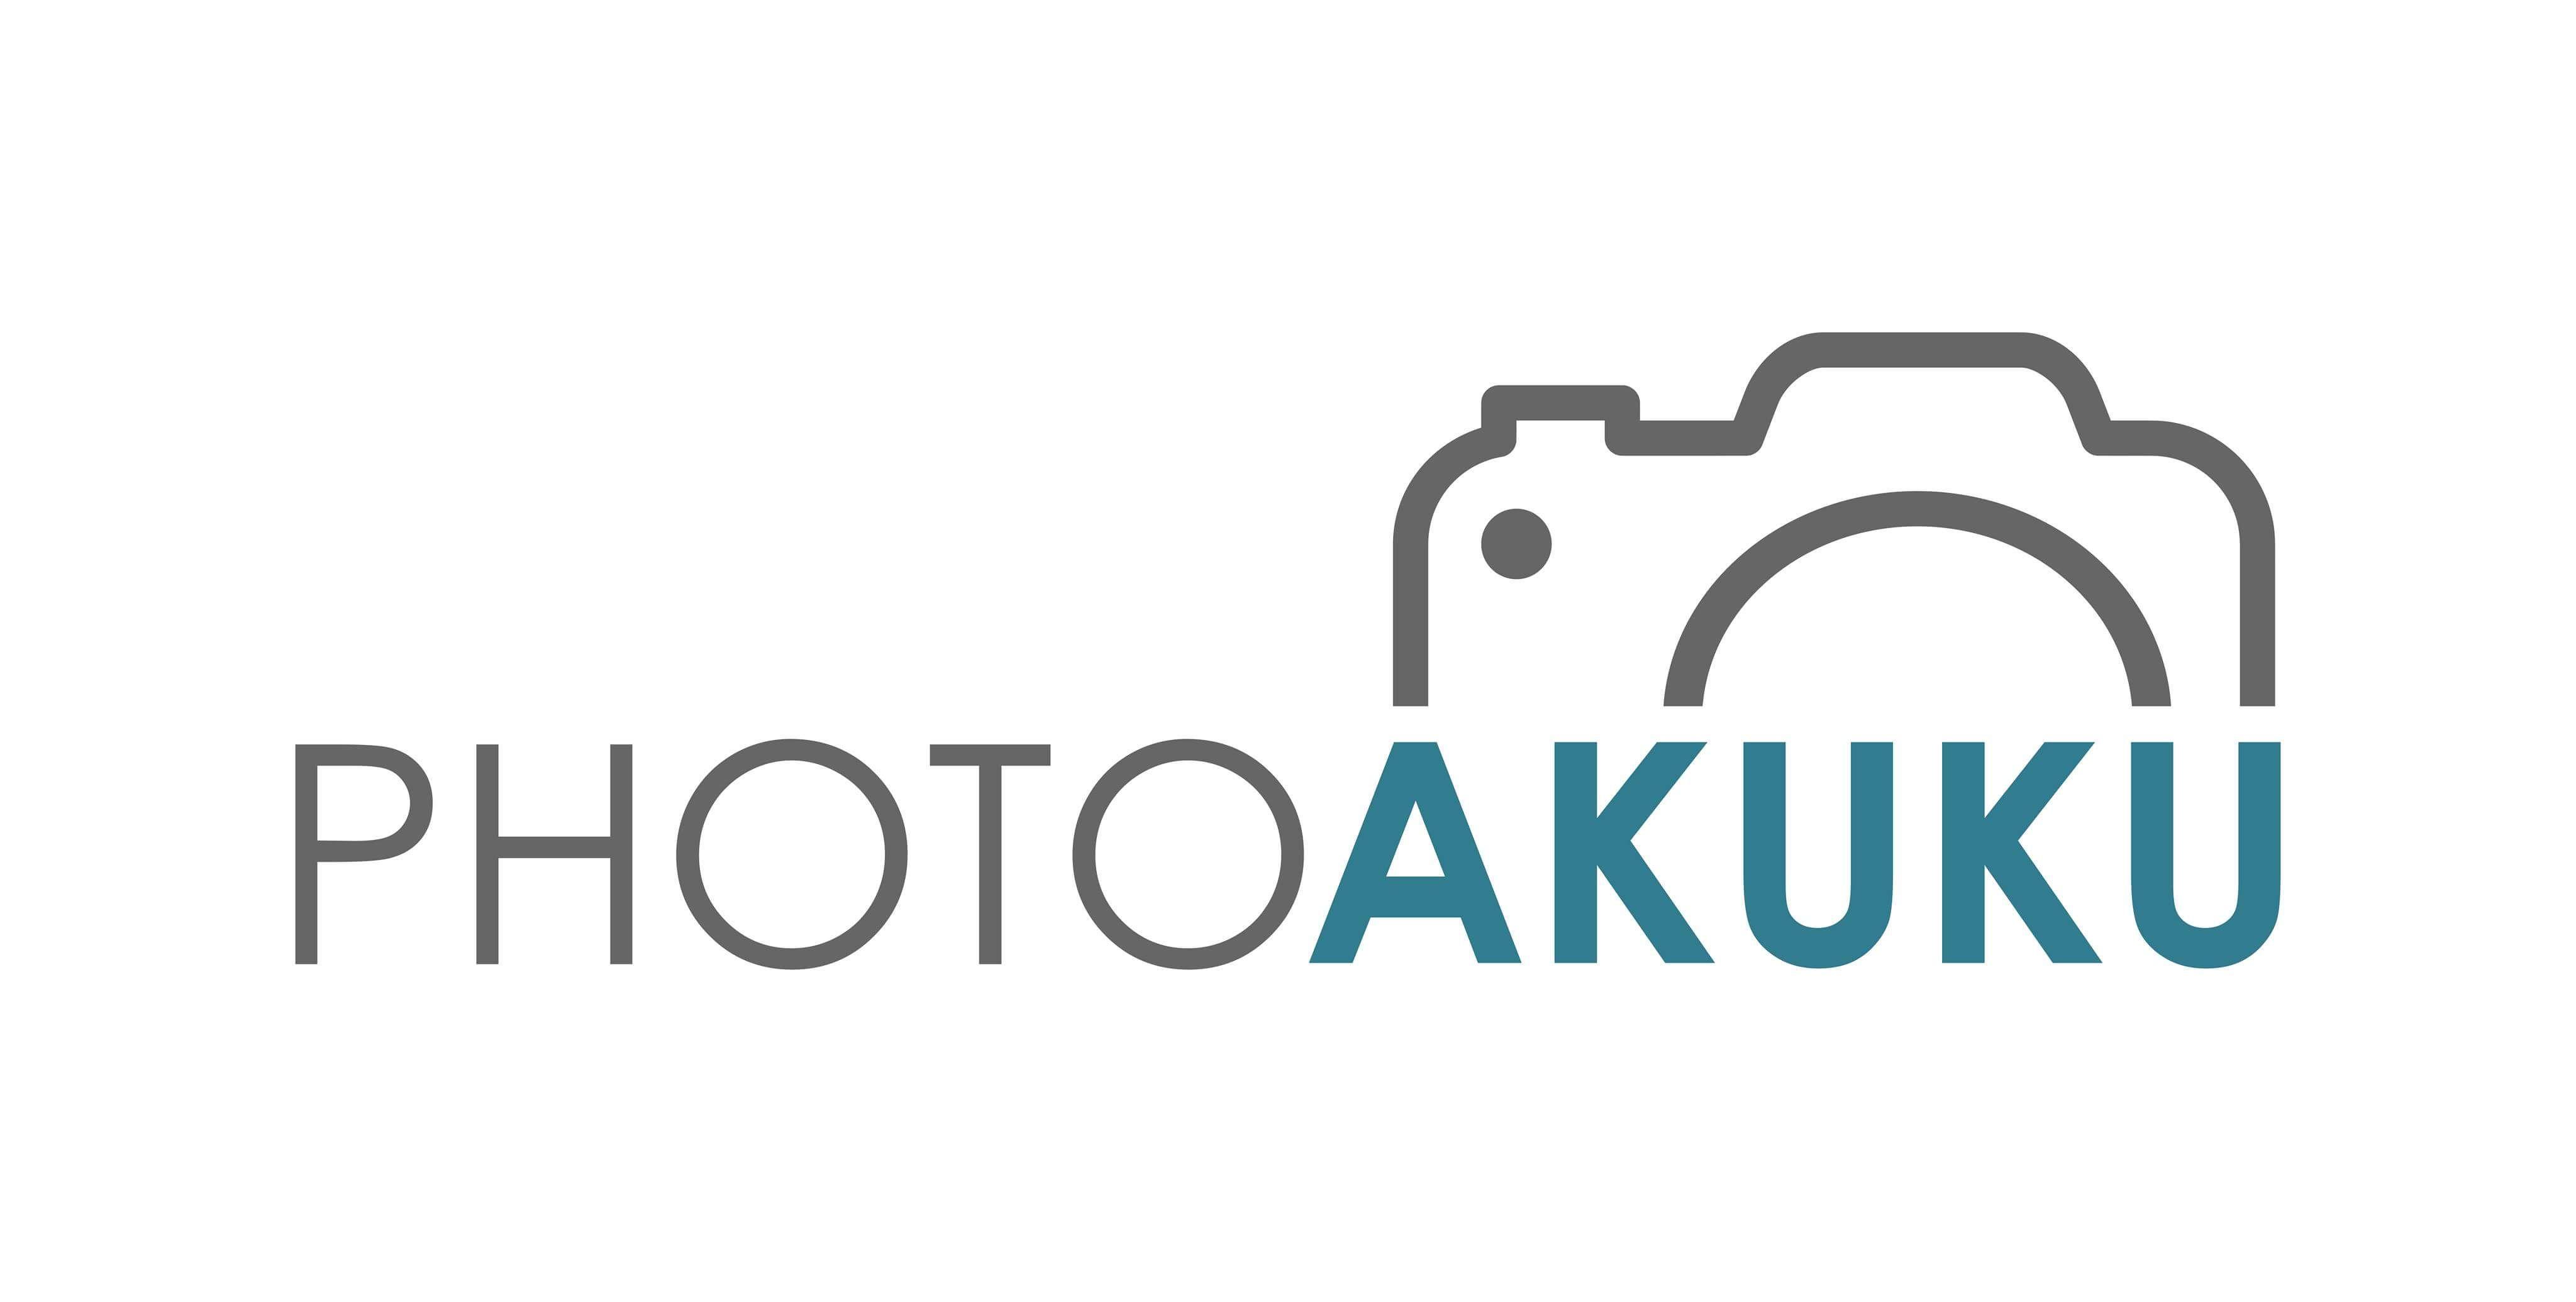 Photoakuku